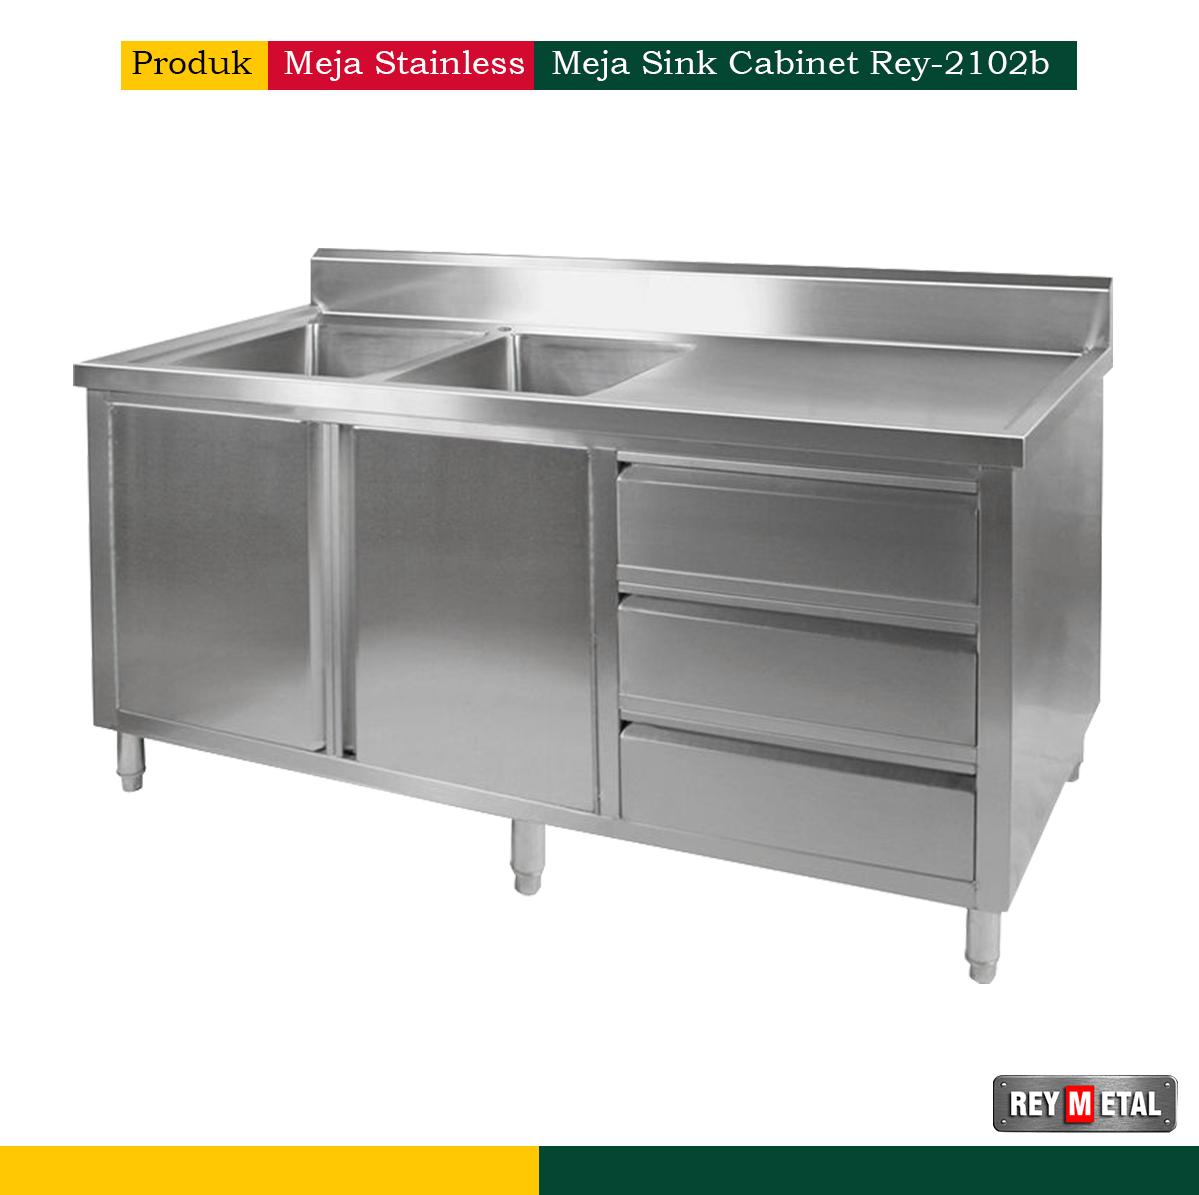 Meja Sink Cabinet Rey-2102b